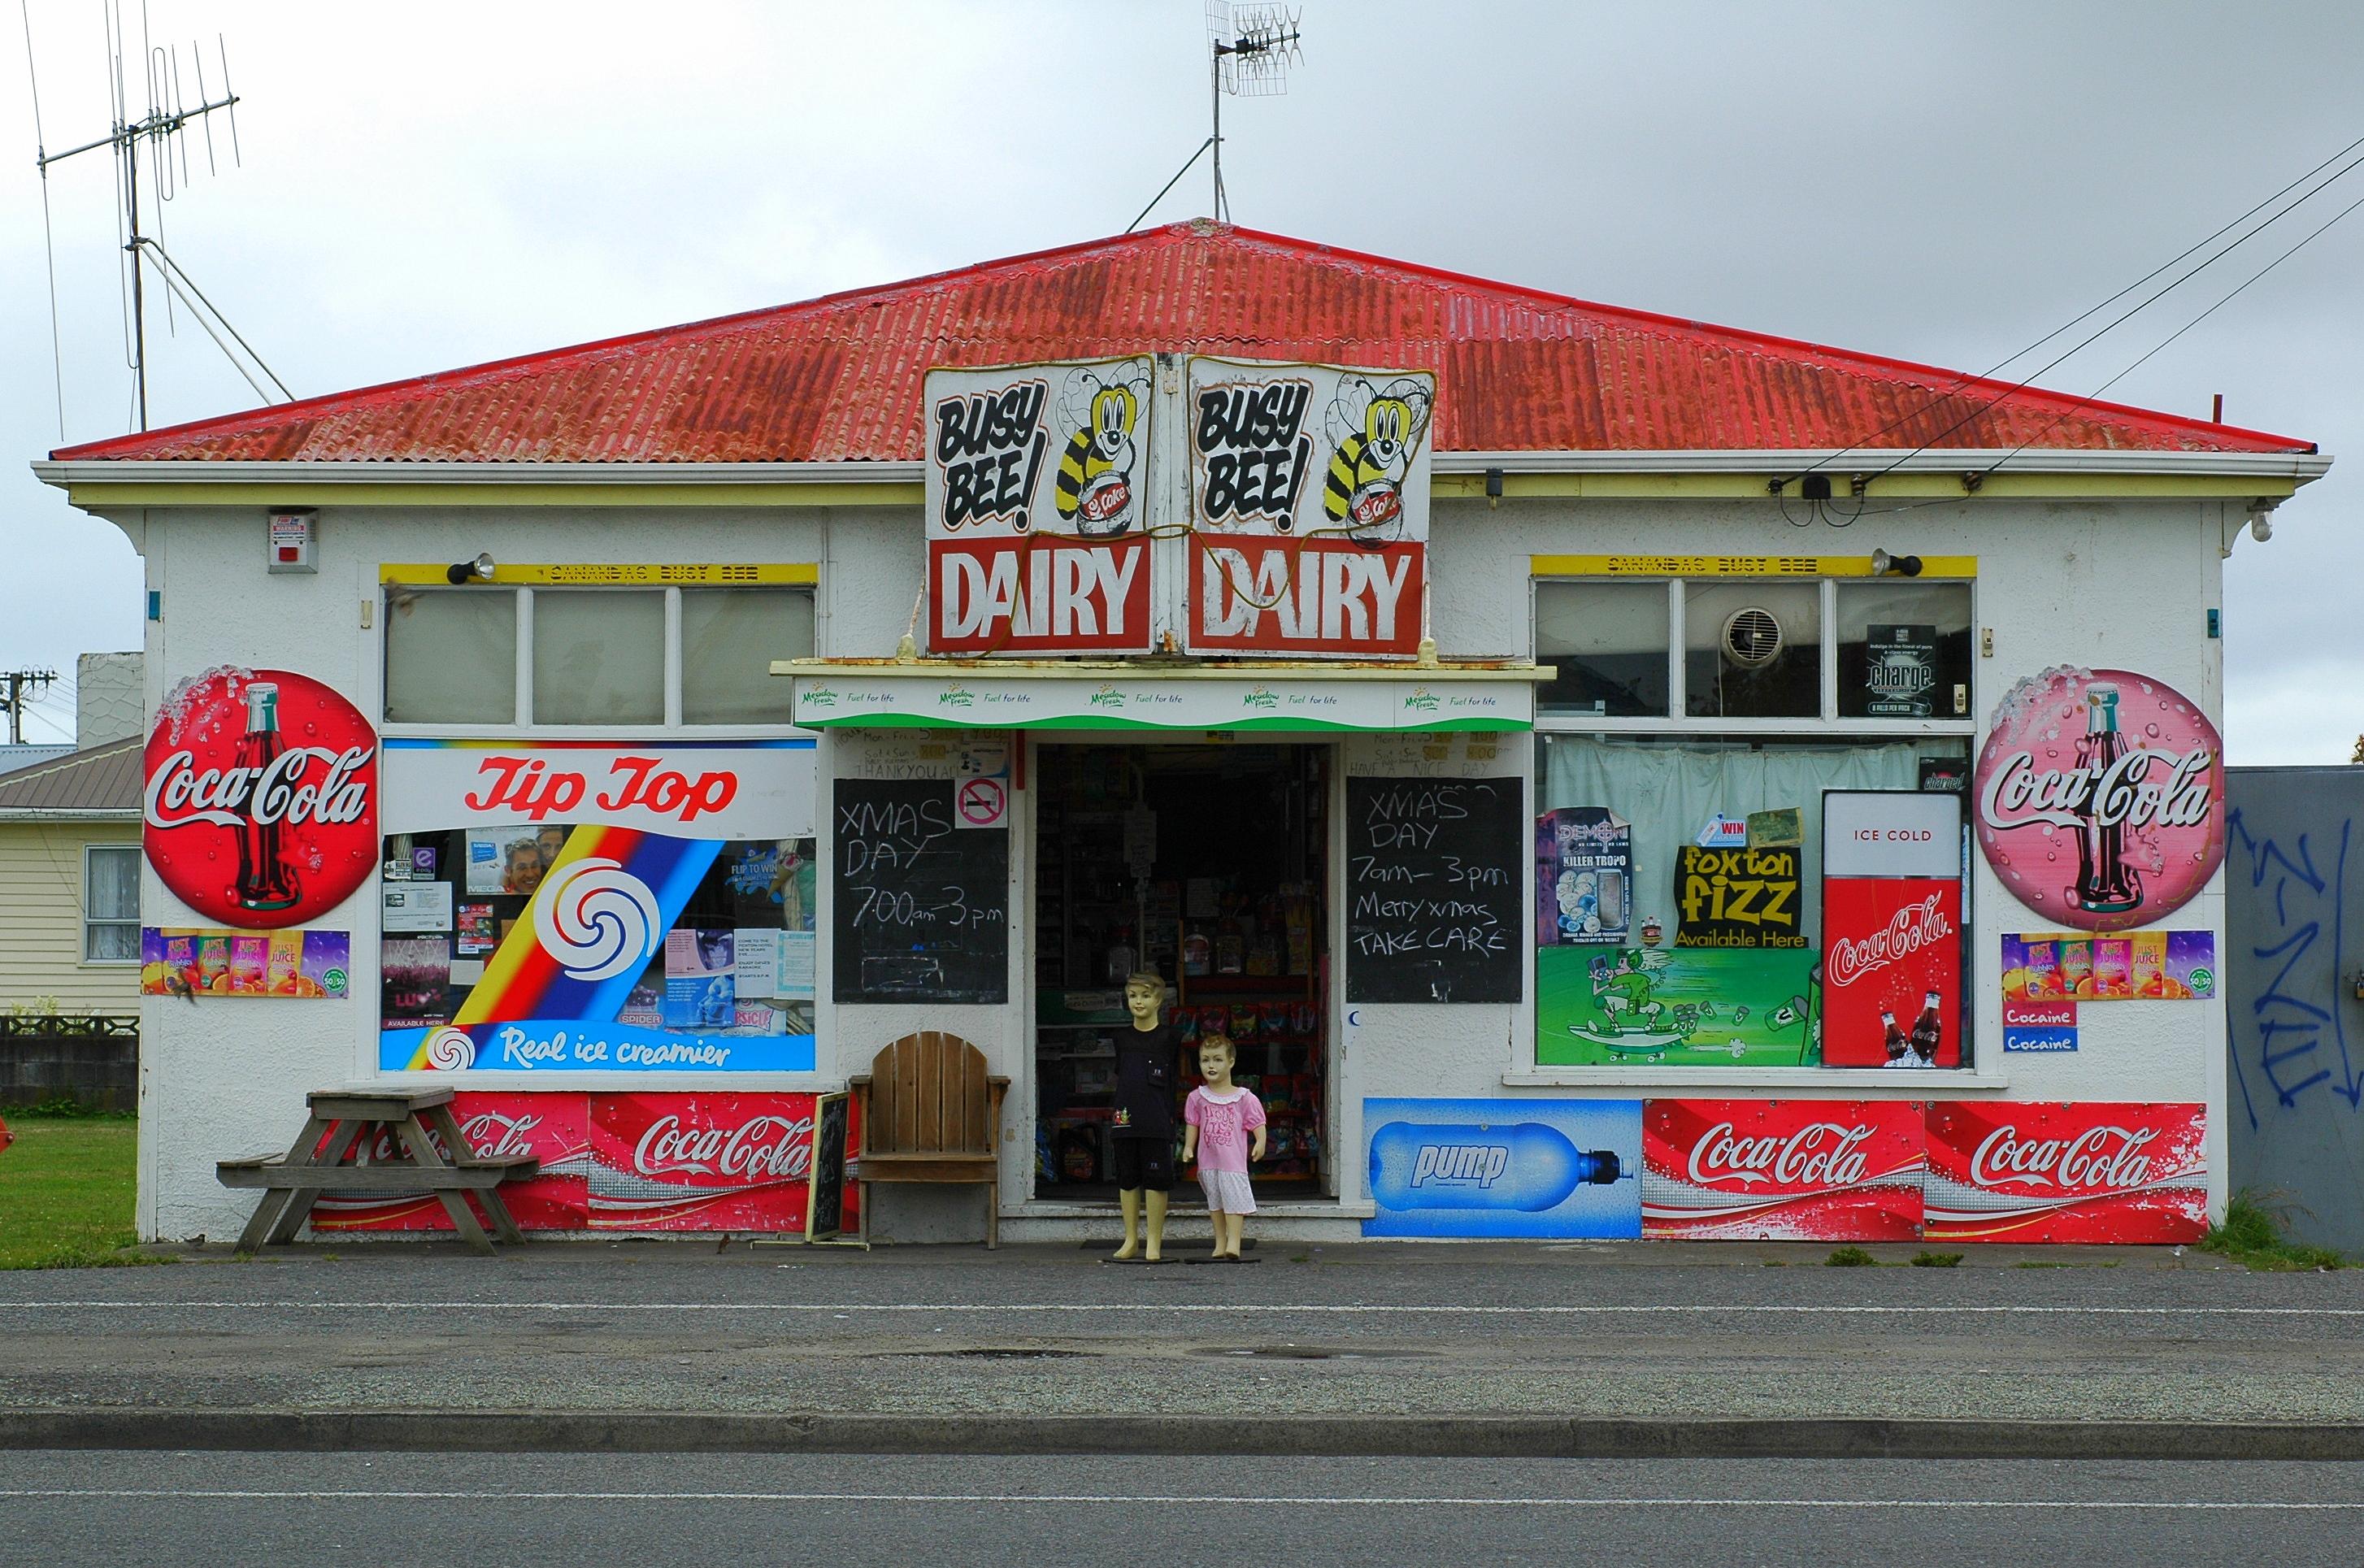 Levin Dairy